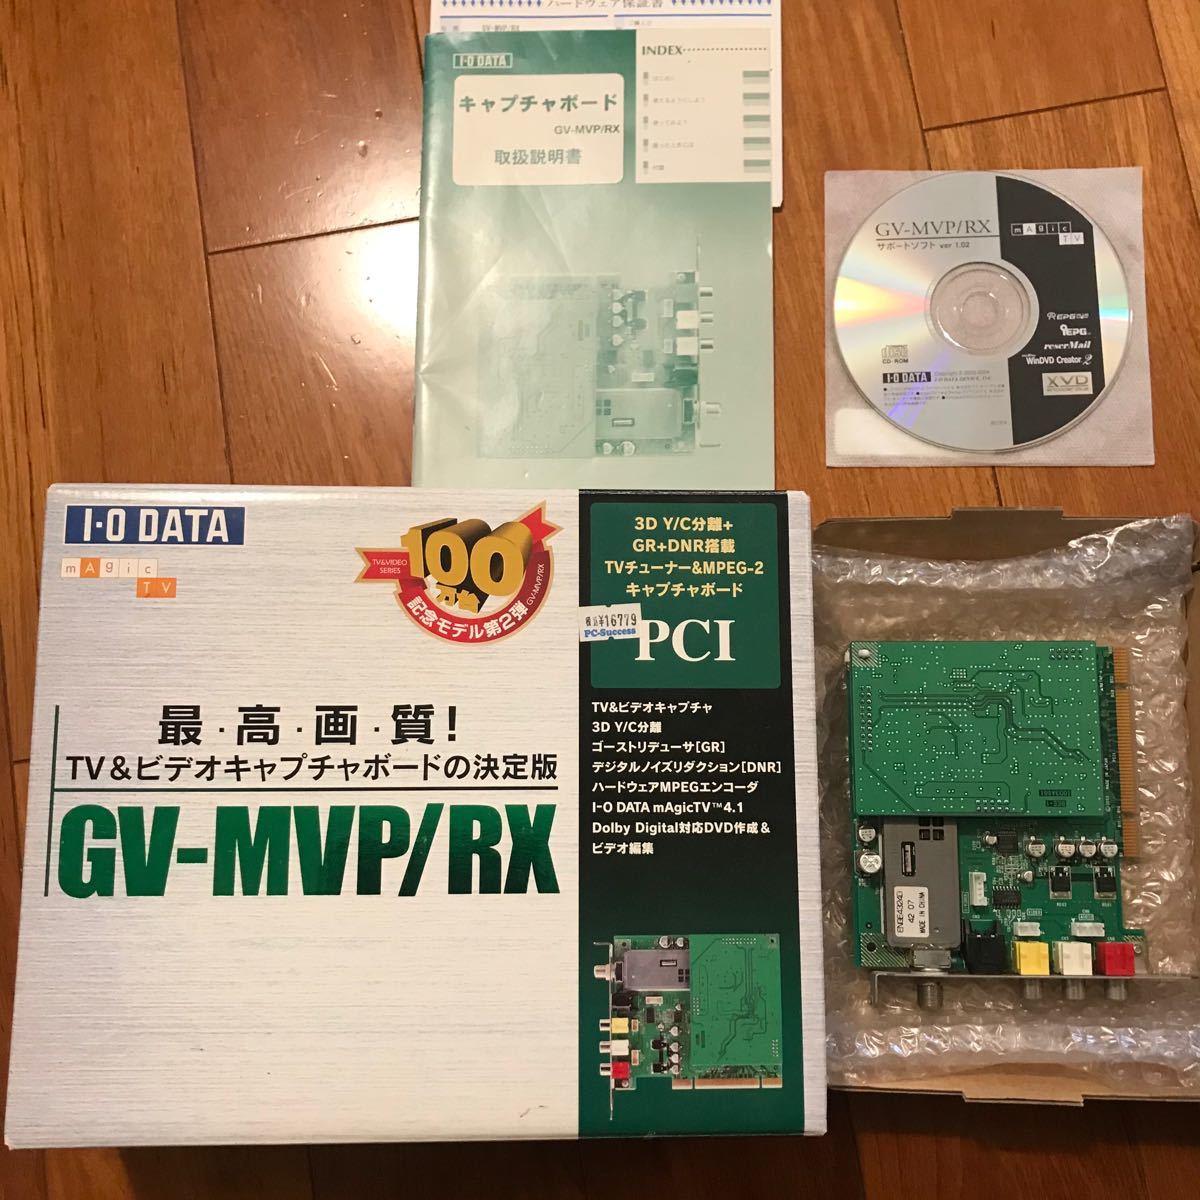 IOデータ ビデオキャプチャボード GV-MVP/RX